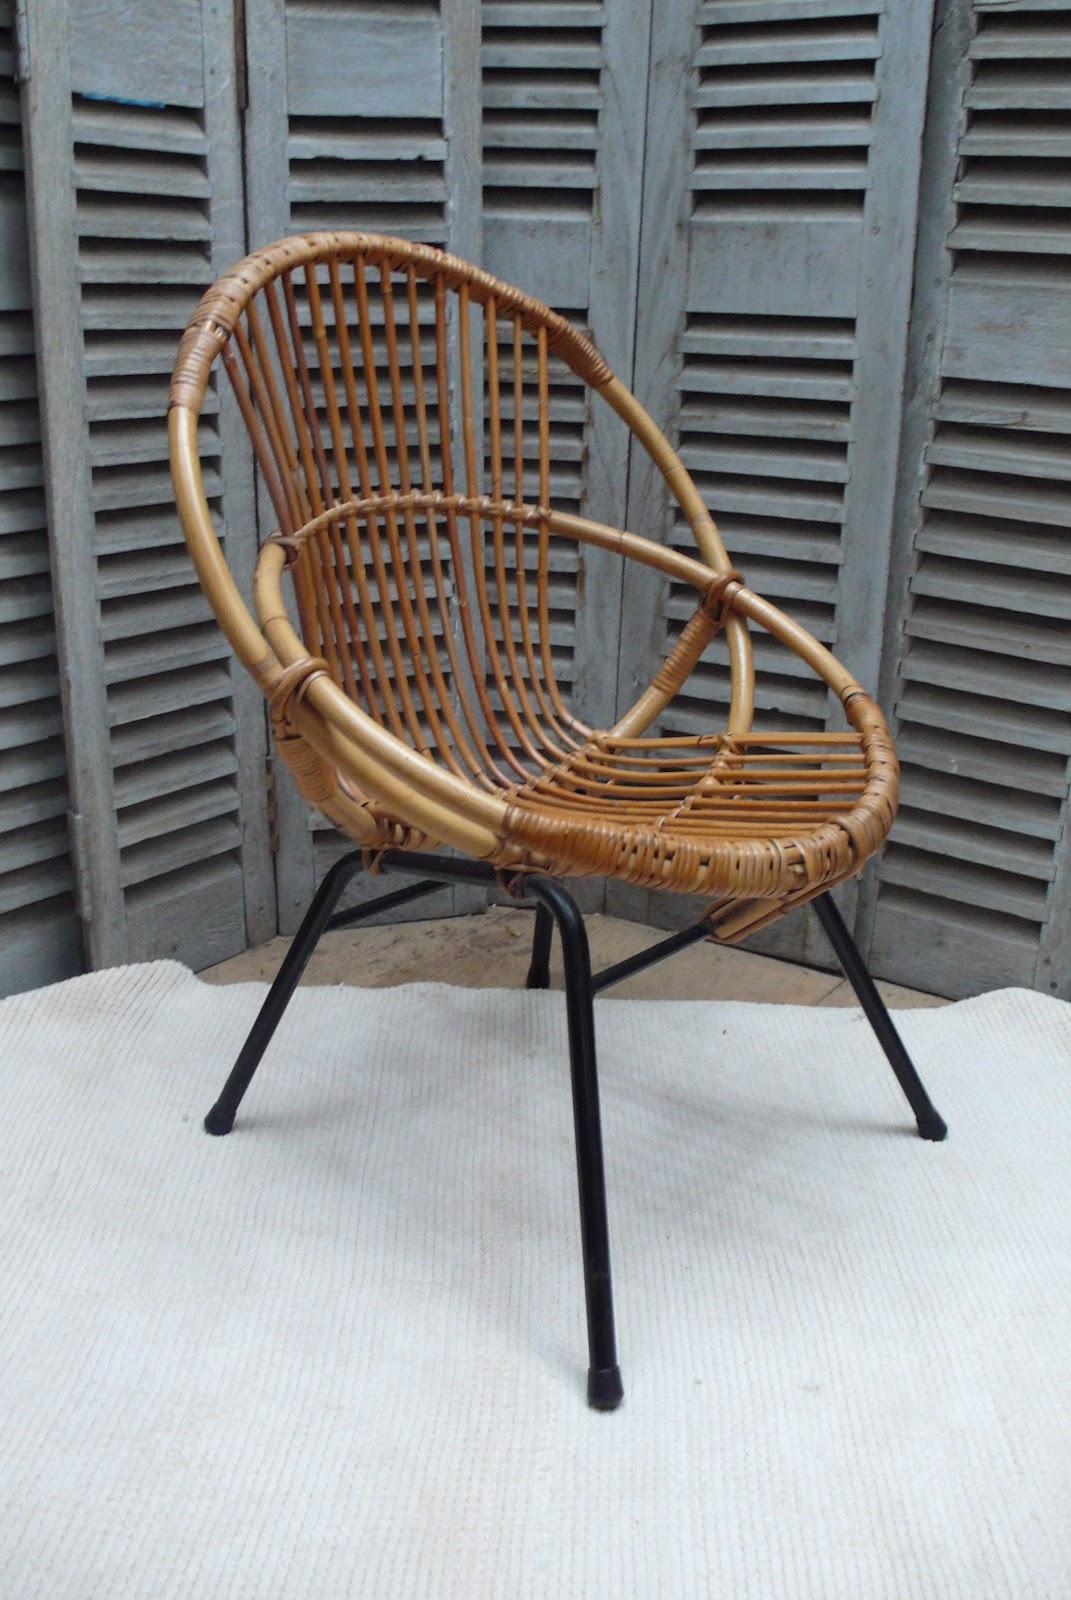 Fauteuil Bambou - Fauteuil bambou